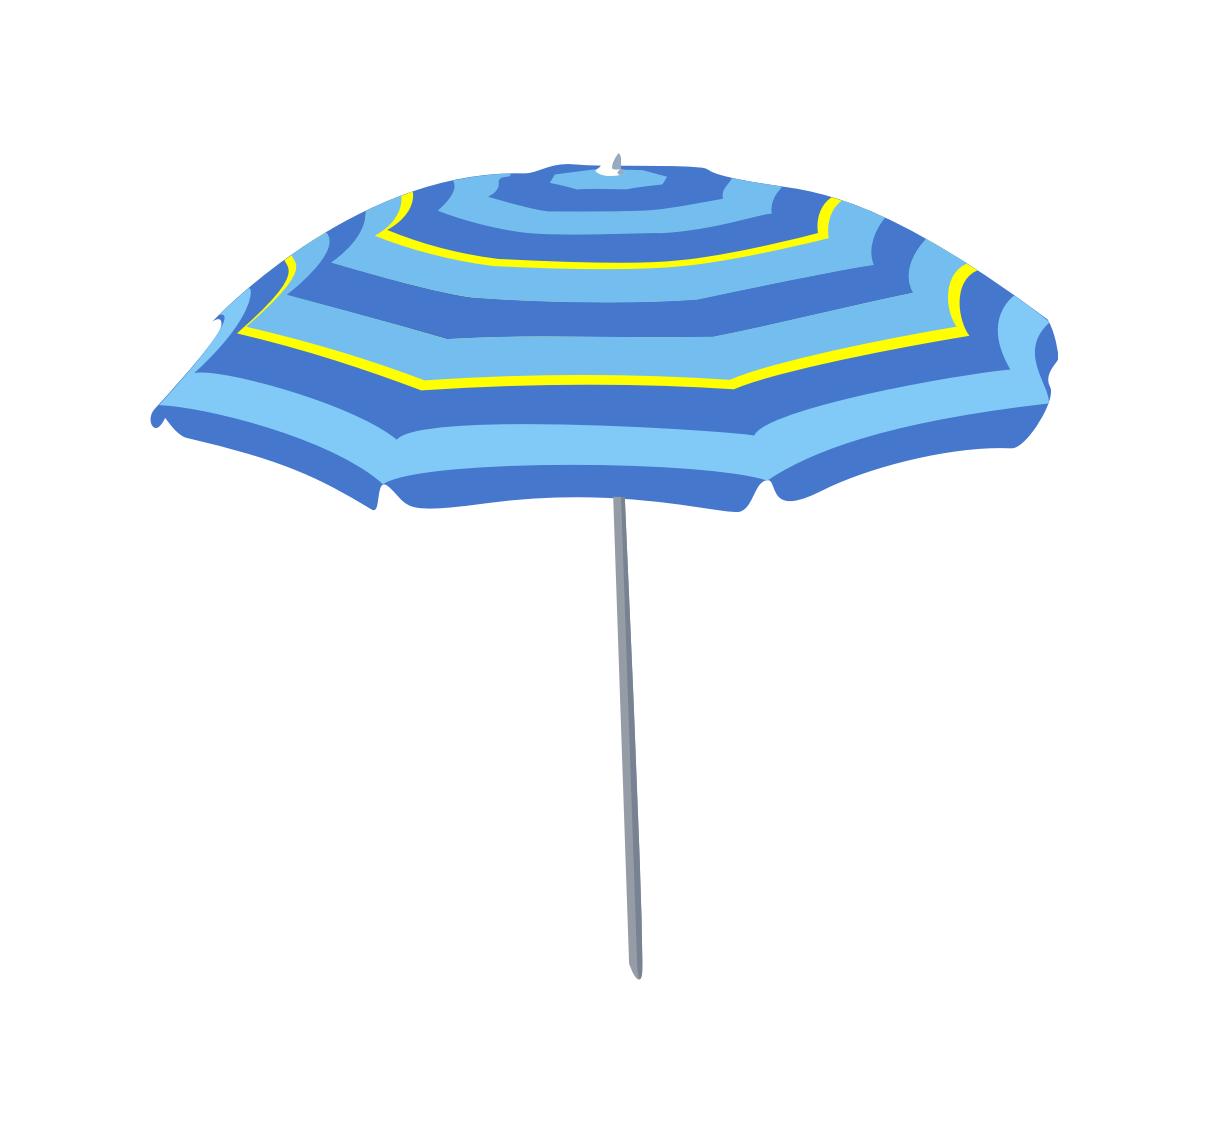 Clipart umbrella wedding indian. Png image free download